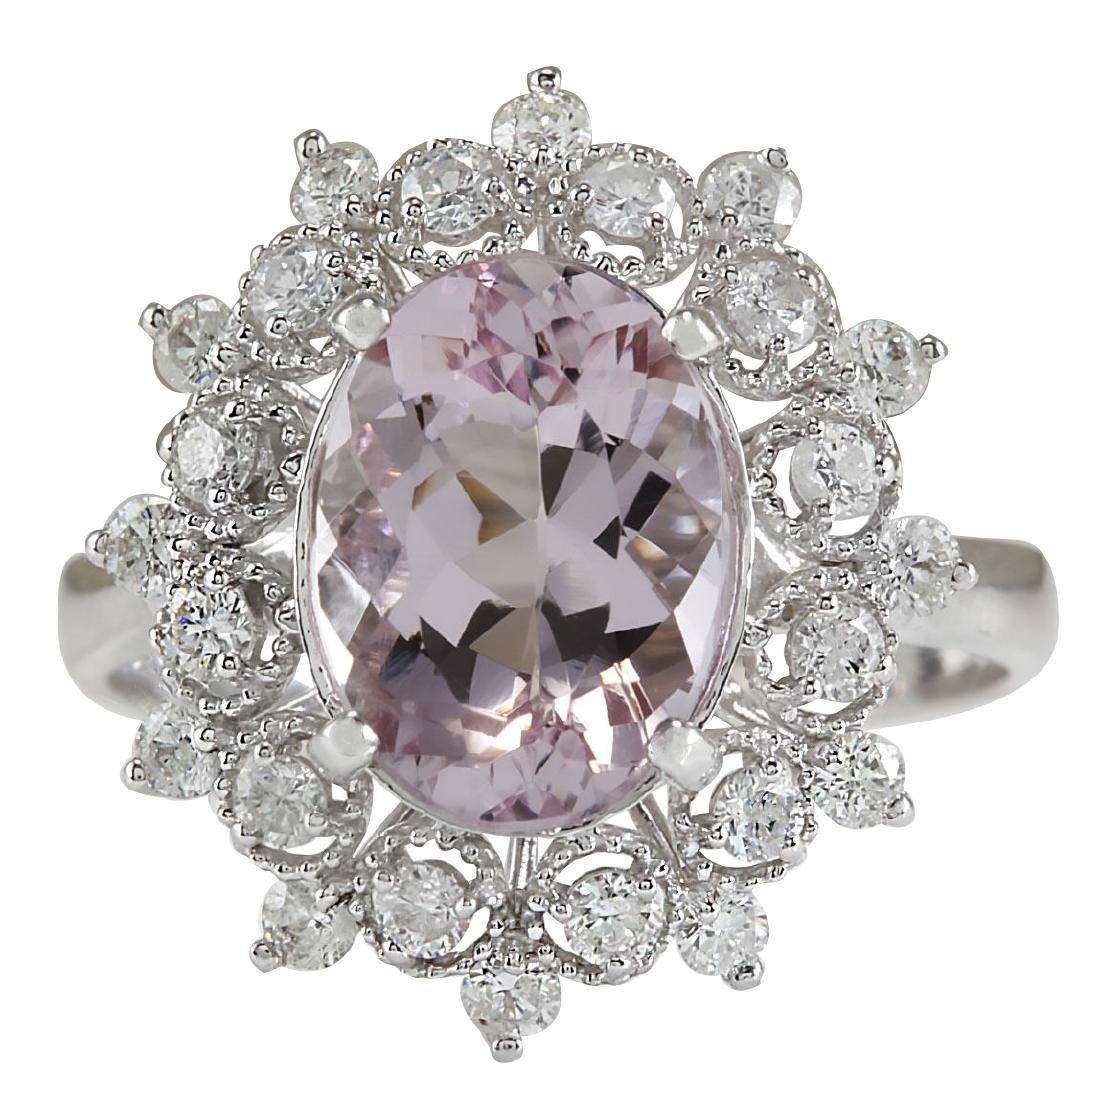 3.68CTW Natural Morganite And Diamond Ring In 18K White